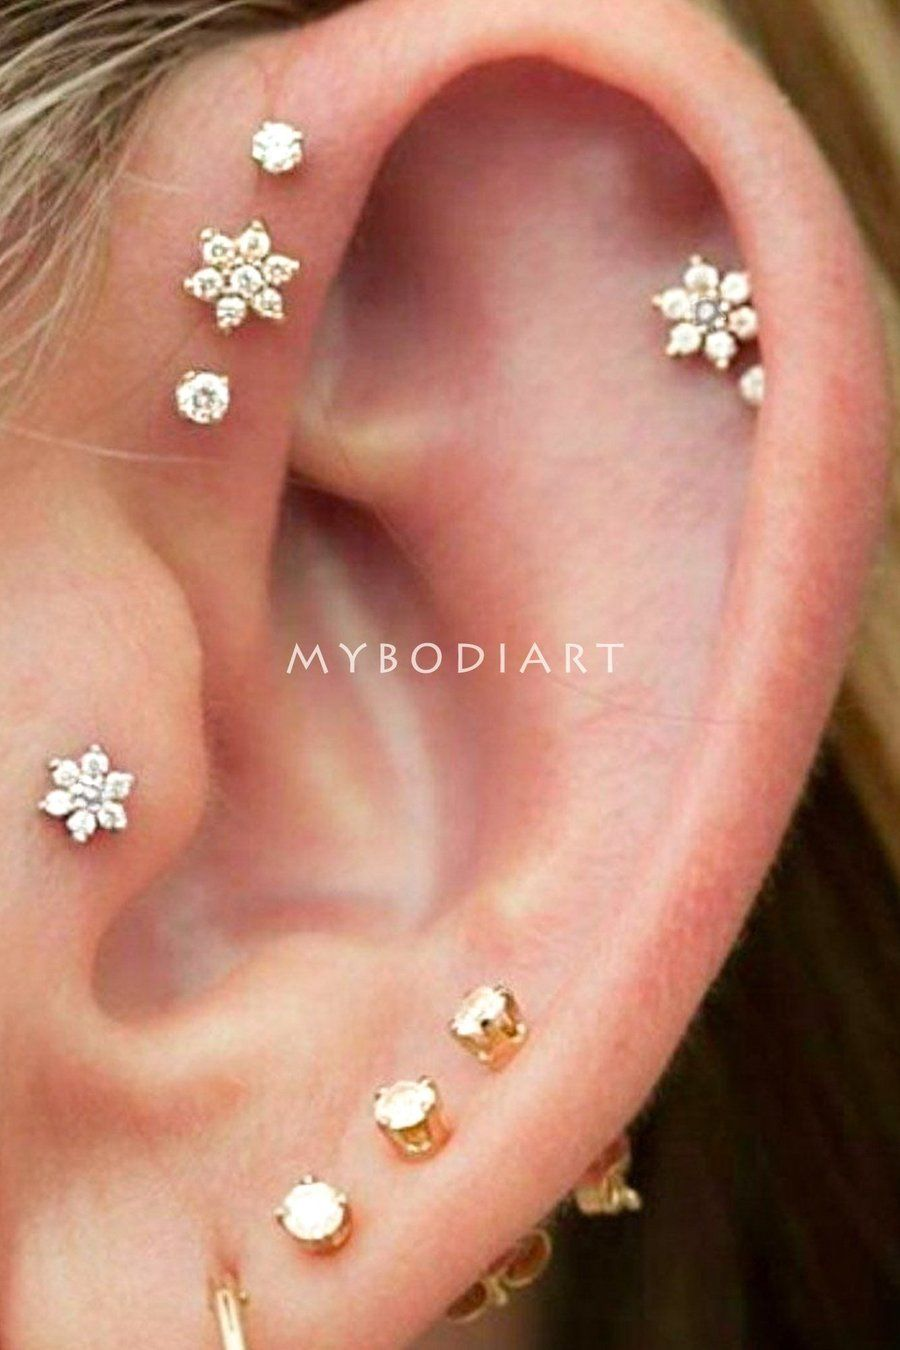 Women Crystal Cartilage Stud Earing Heart Flower Piercing Tragus Body Jewelry